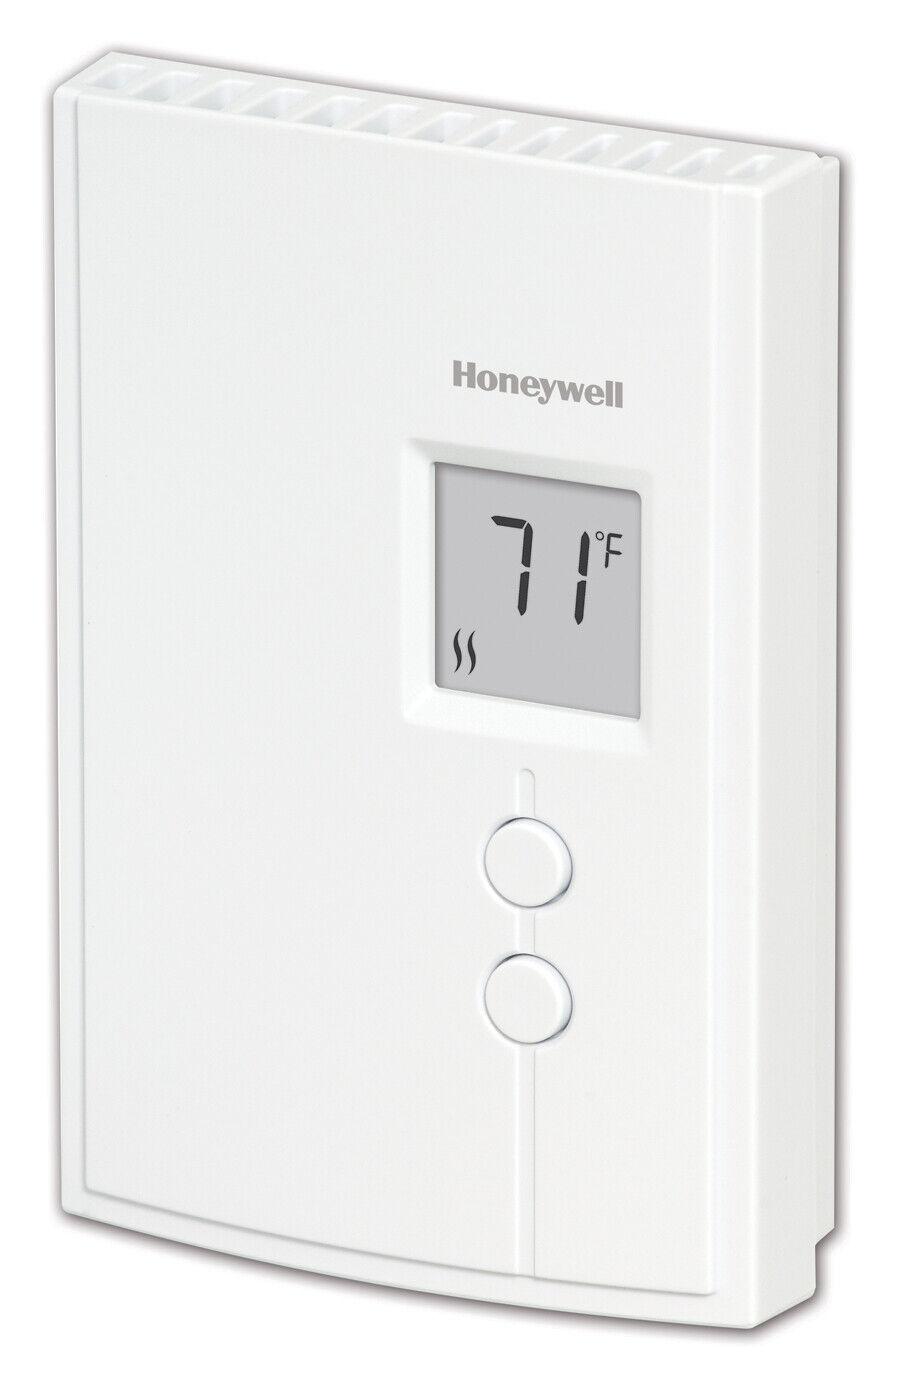 * Honeywell RLV3120A Electric Heat Digital Non-Programmable